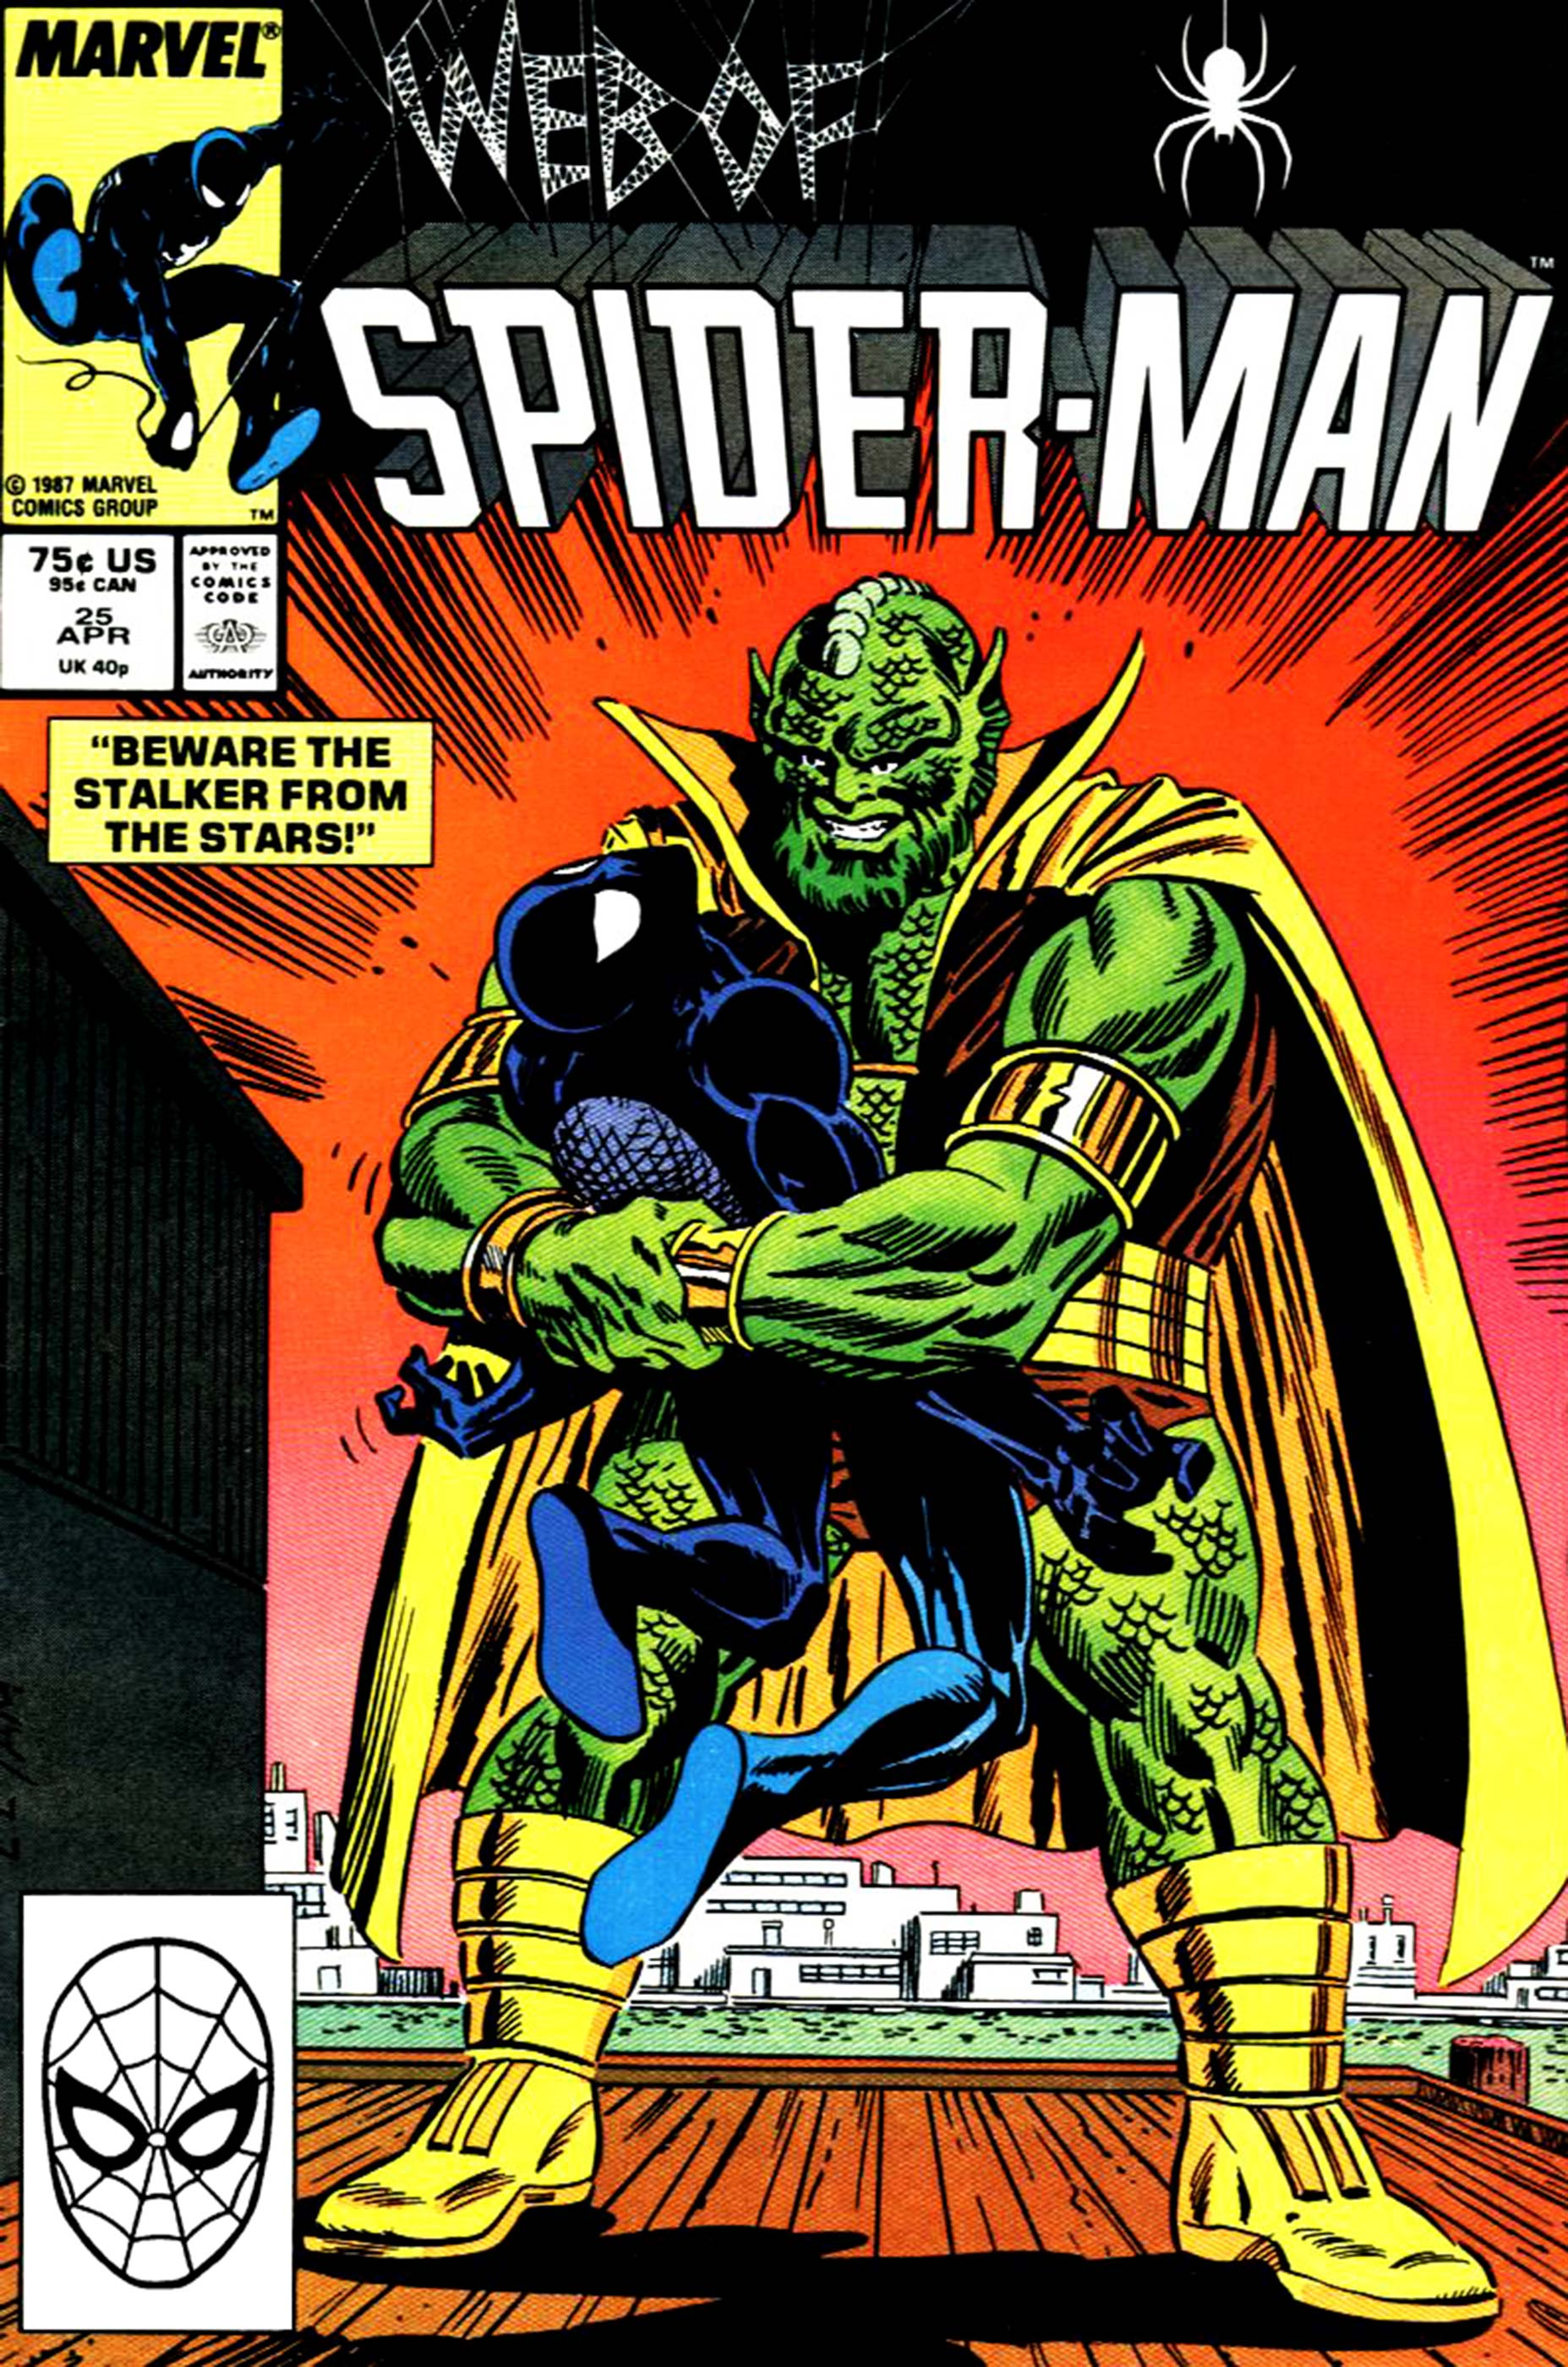 Web of Spider-Man (1985) #25